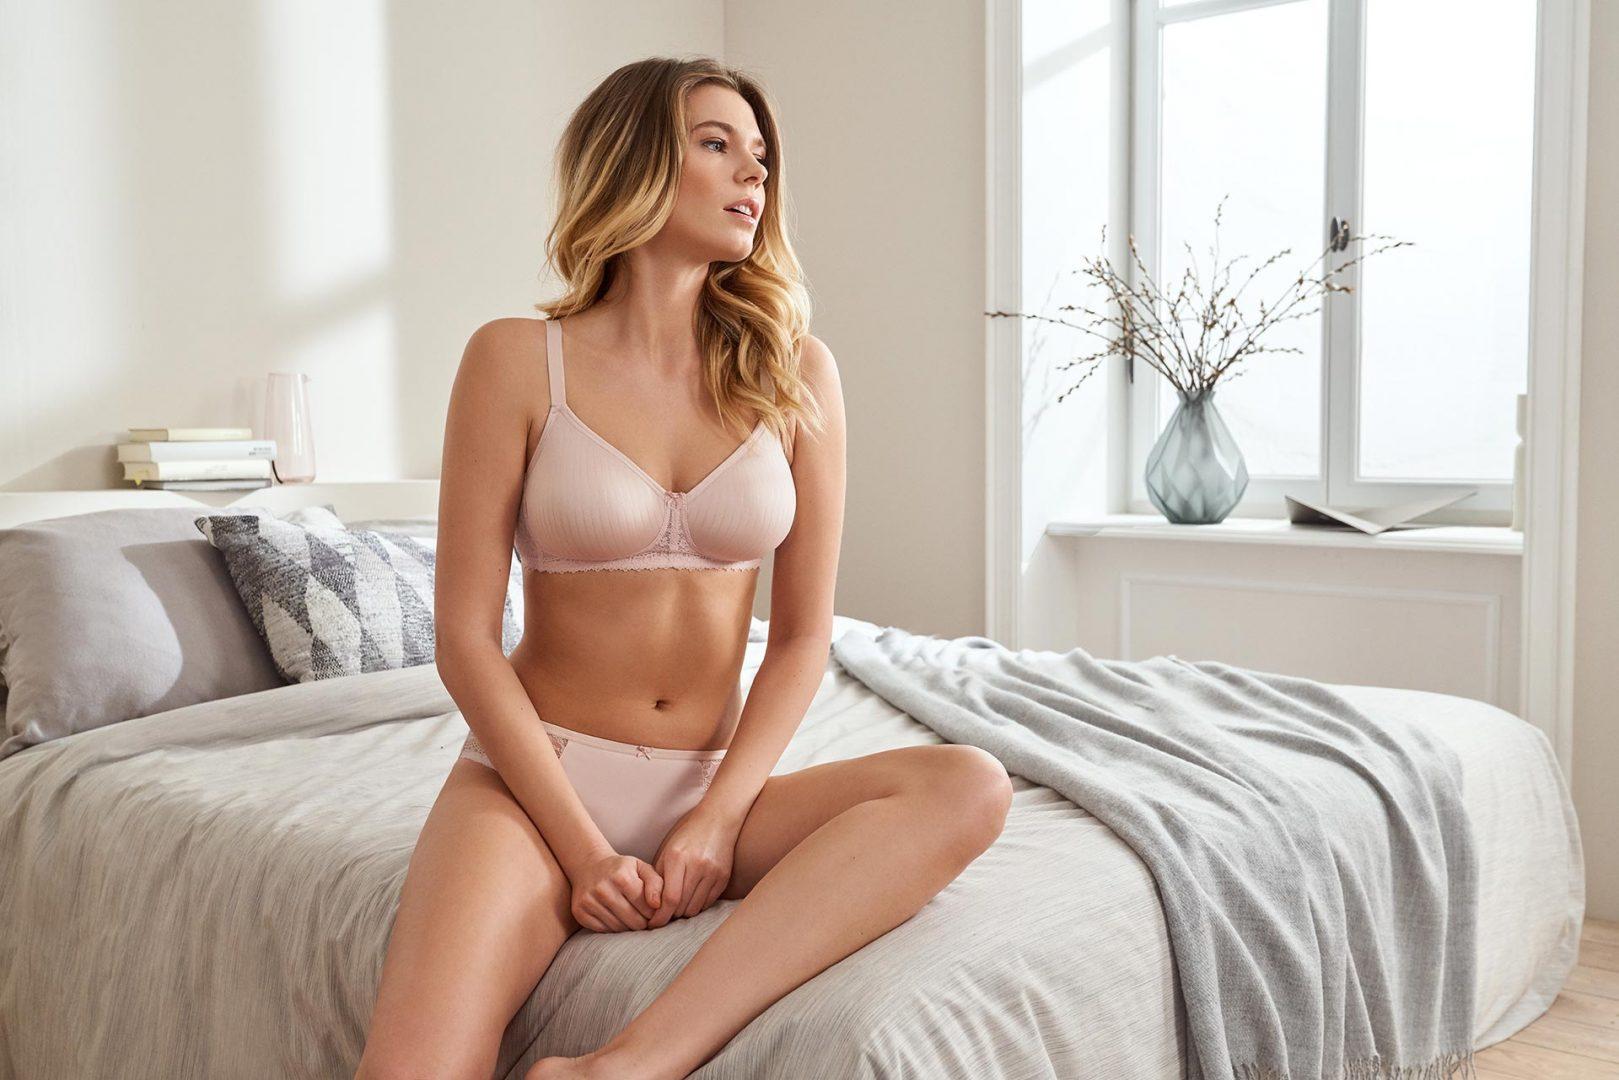 model looking over